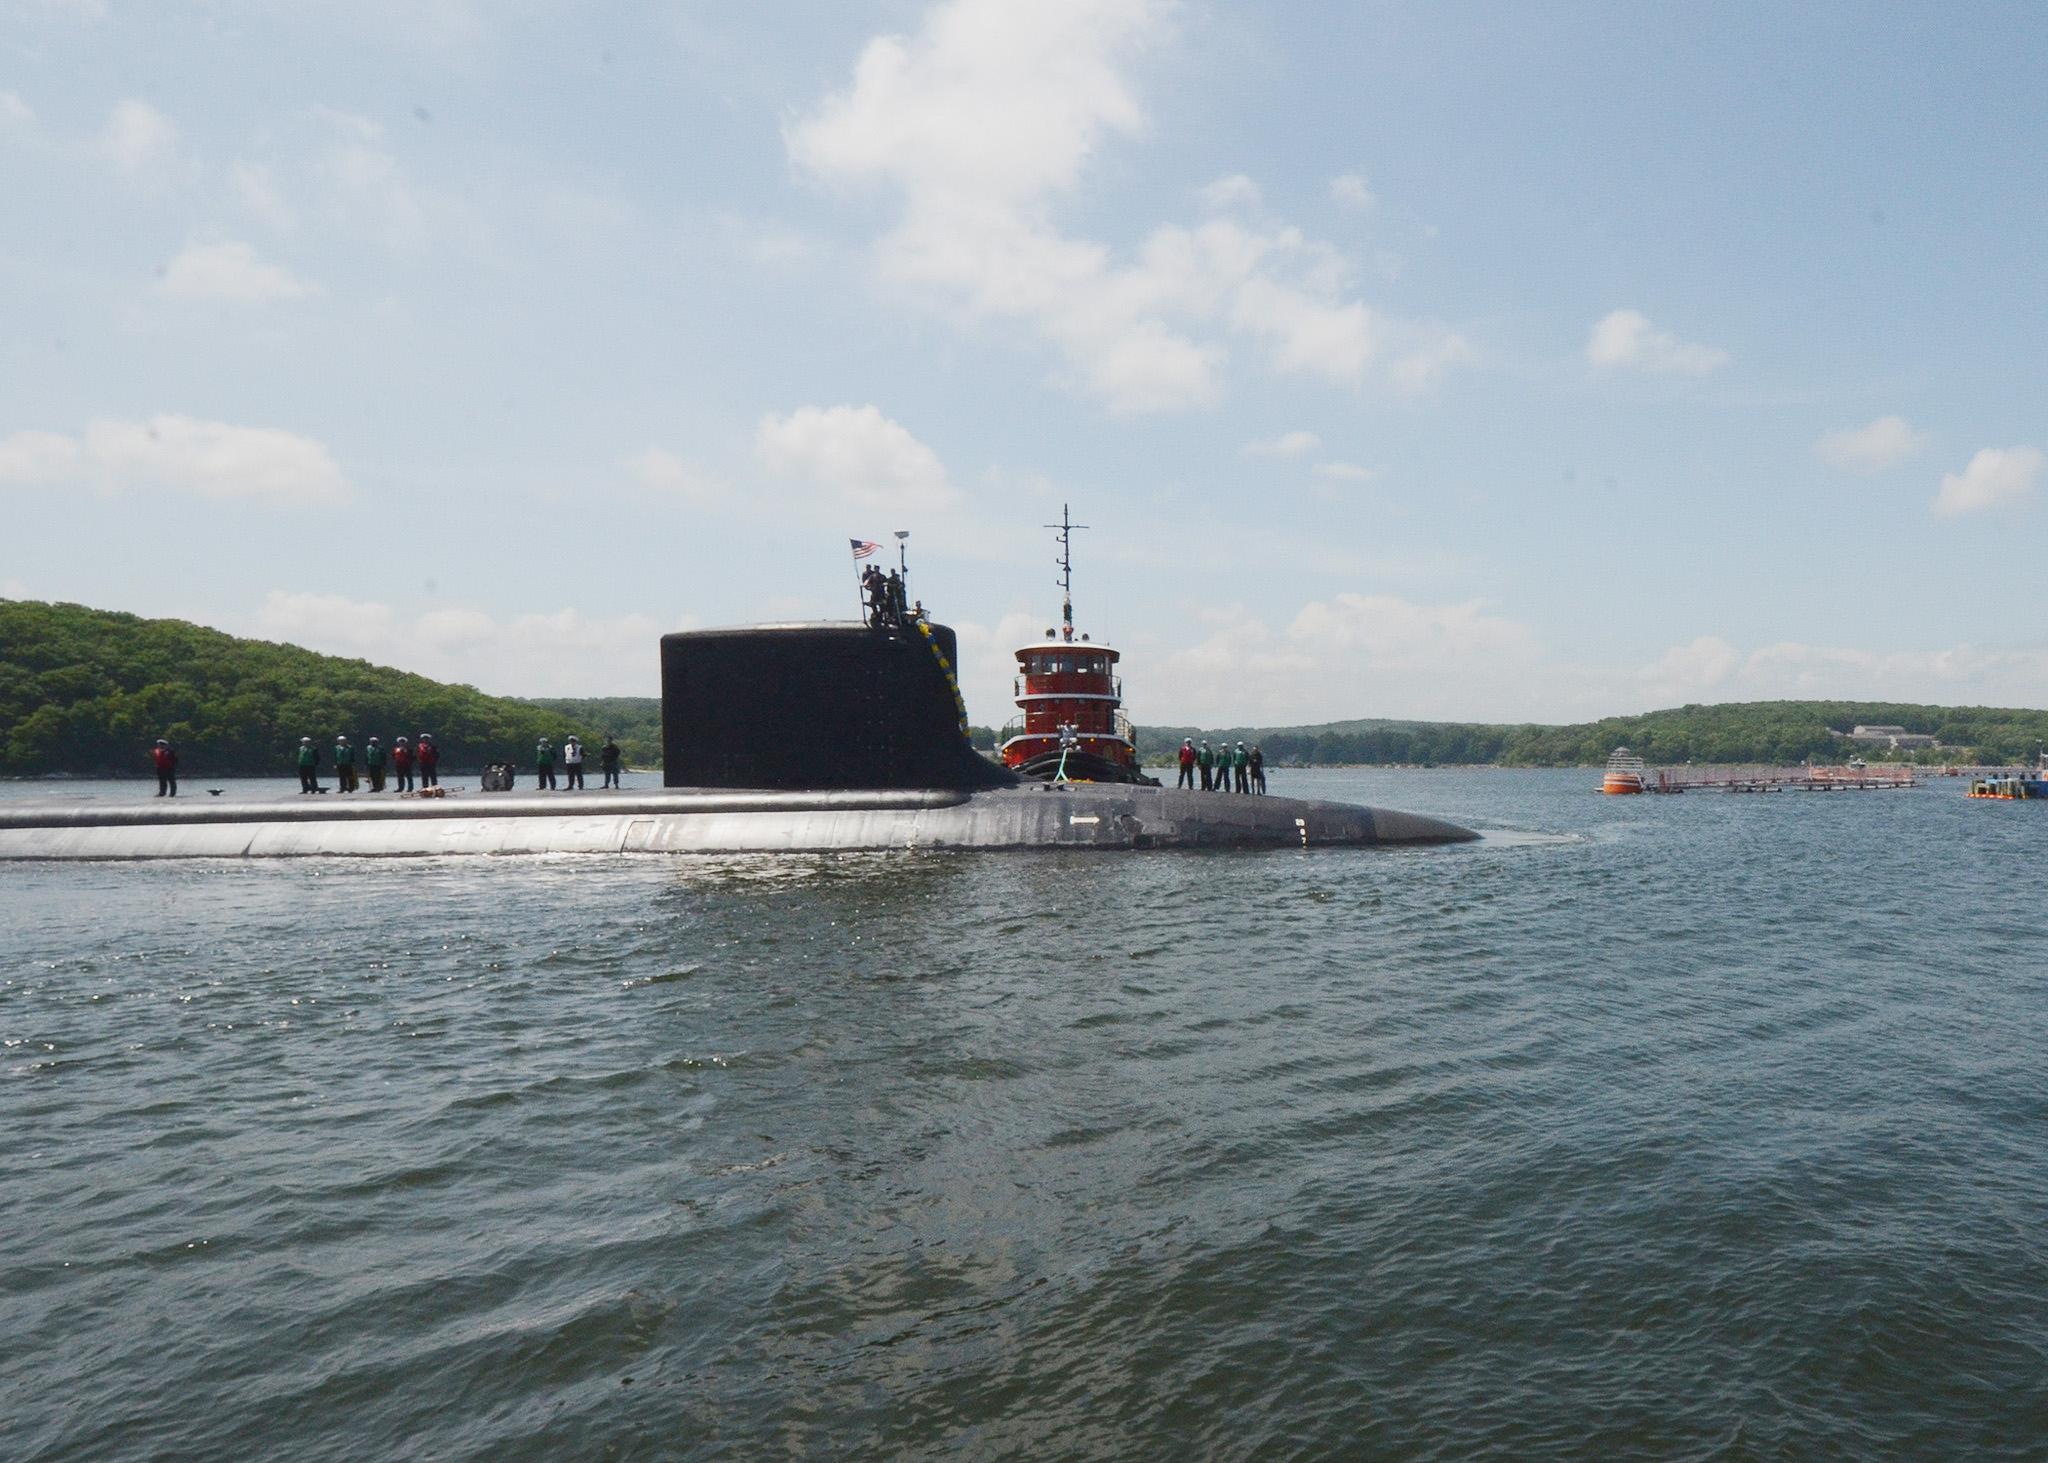 USS VIRGINIA SSN-774 Einlaufen Groton am 03.07.2014 Bild: U.S. Navy